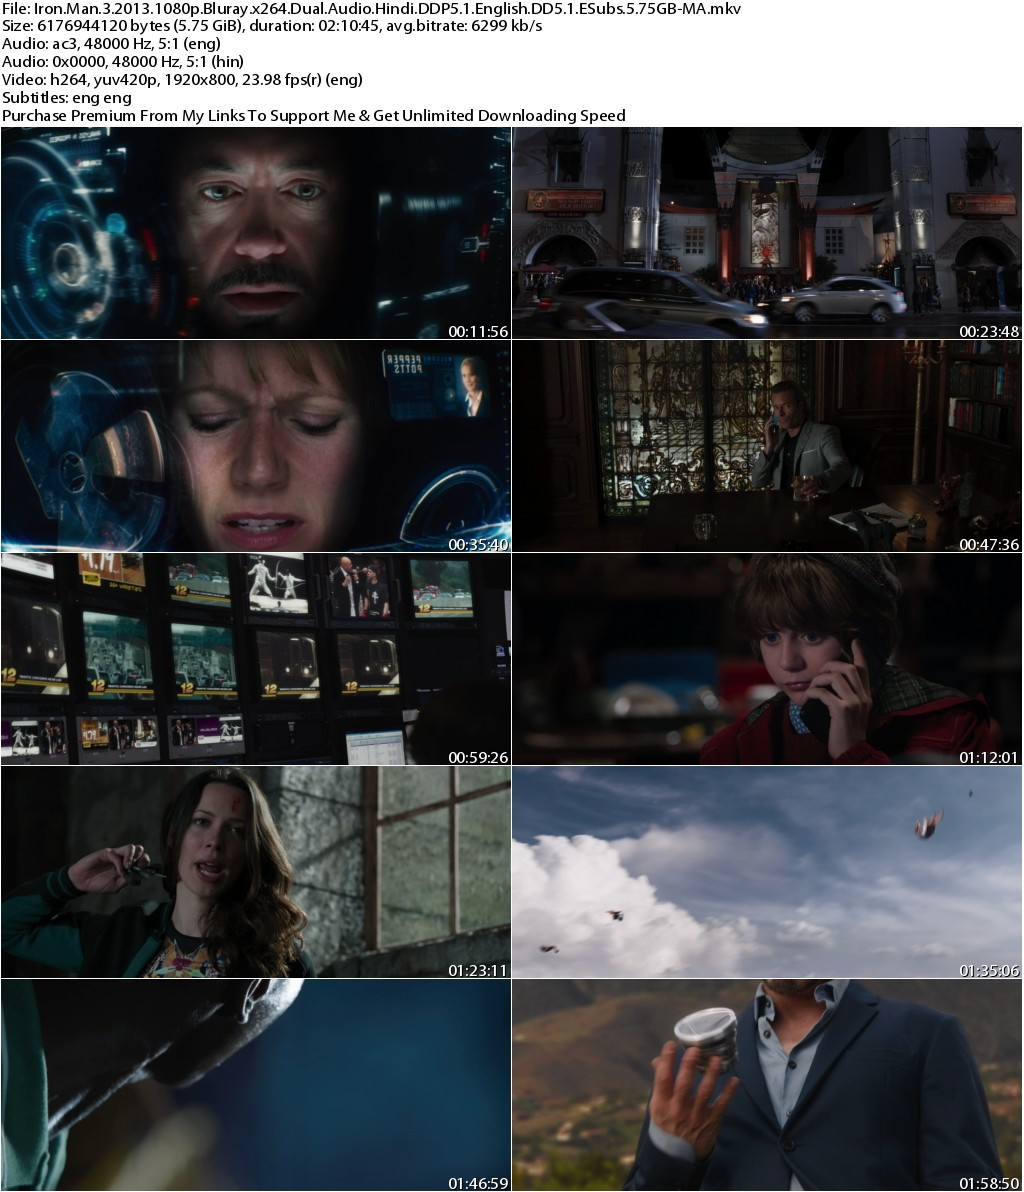 Iron Man 3 (2013) 1080p Bluray x264 Dual Audio Hindi DDP5.1 English DD5.1 ESubs 5.75GB-MA